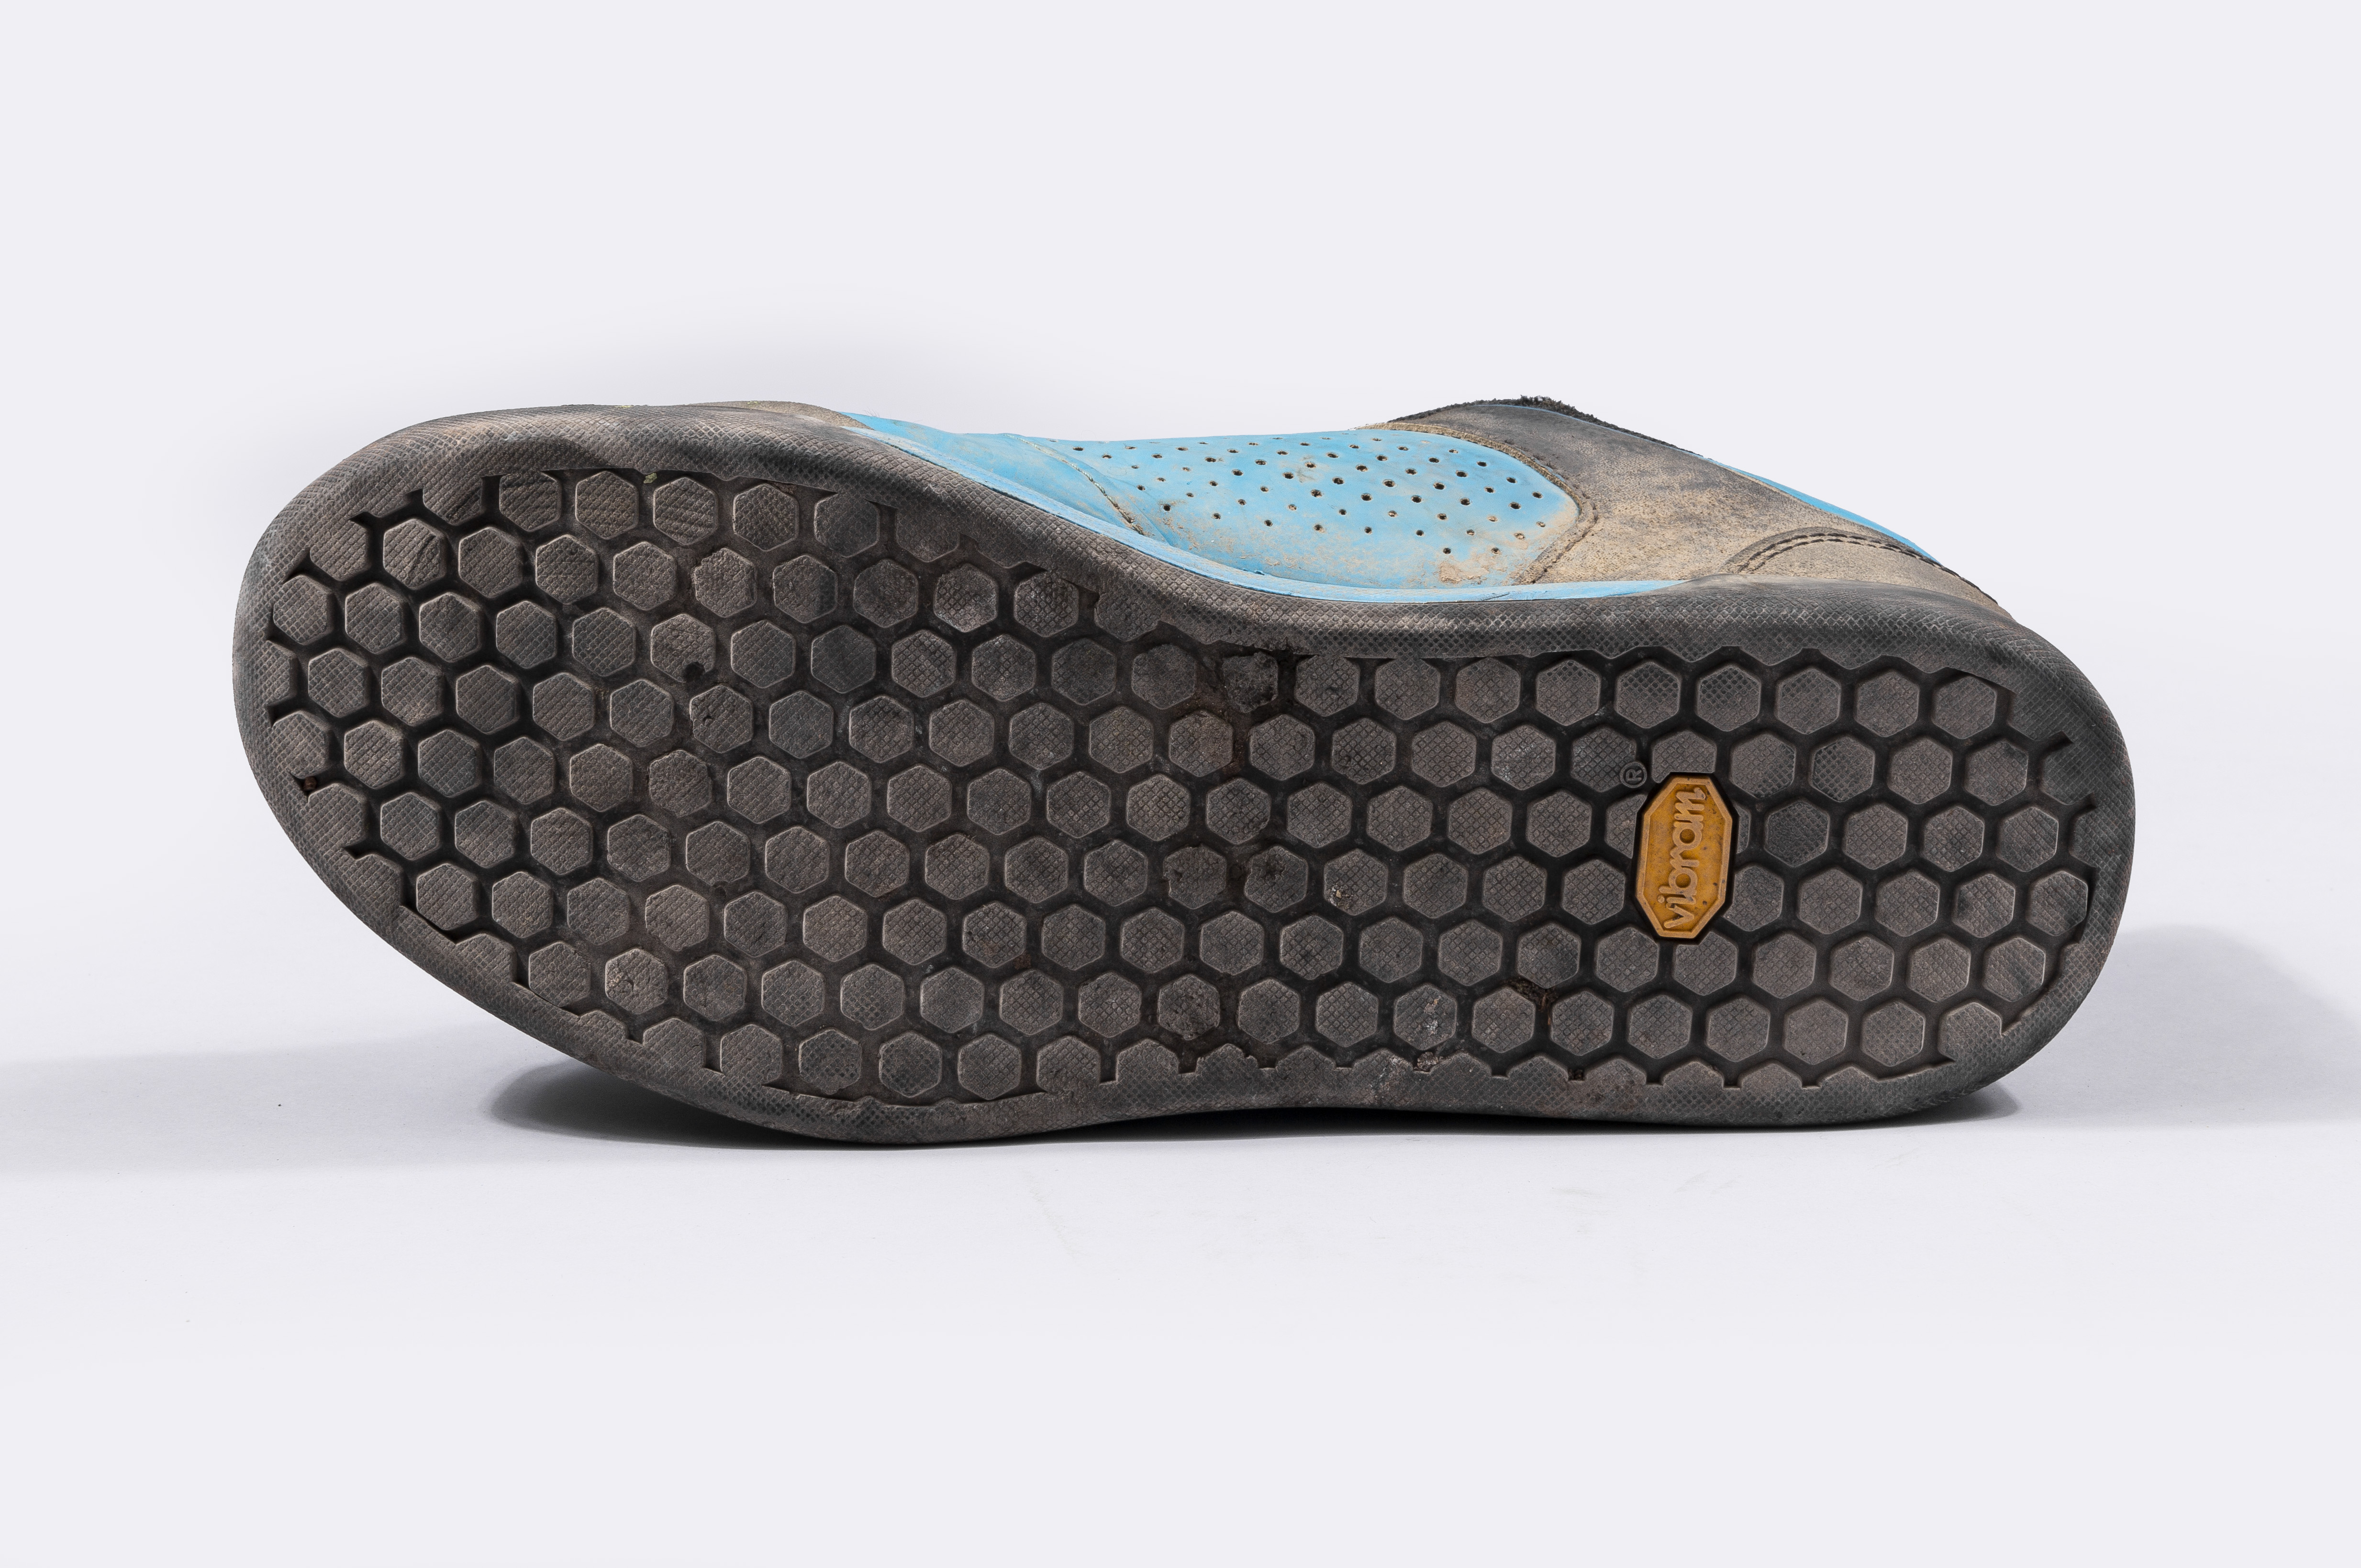 Giro Riddance shoe review - MBR